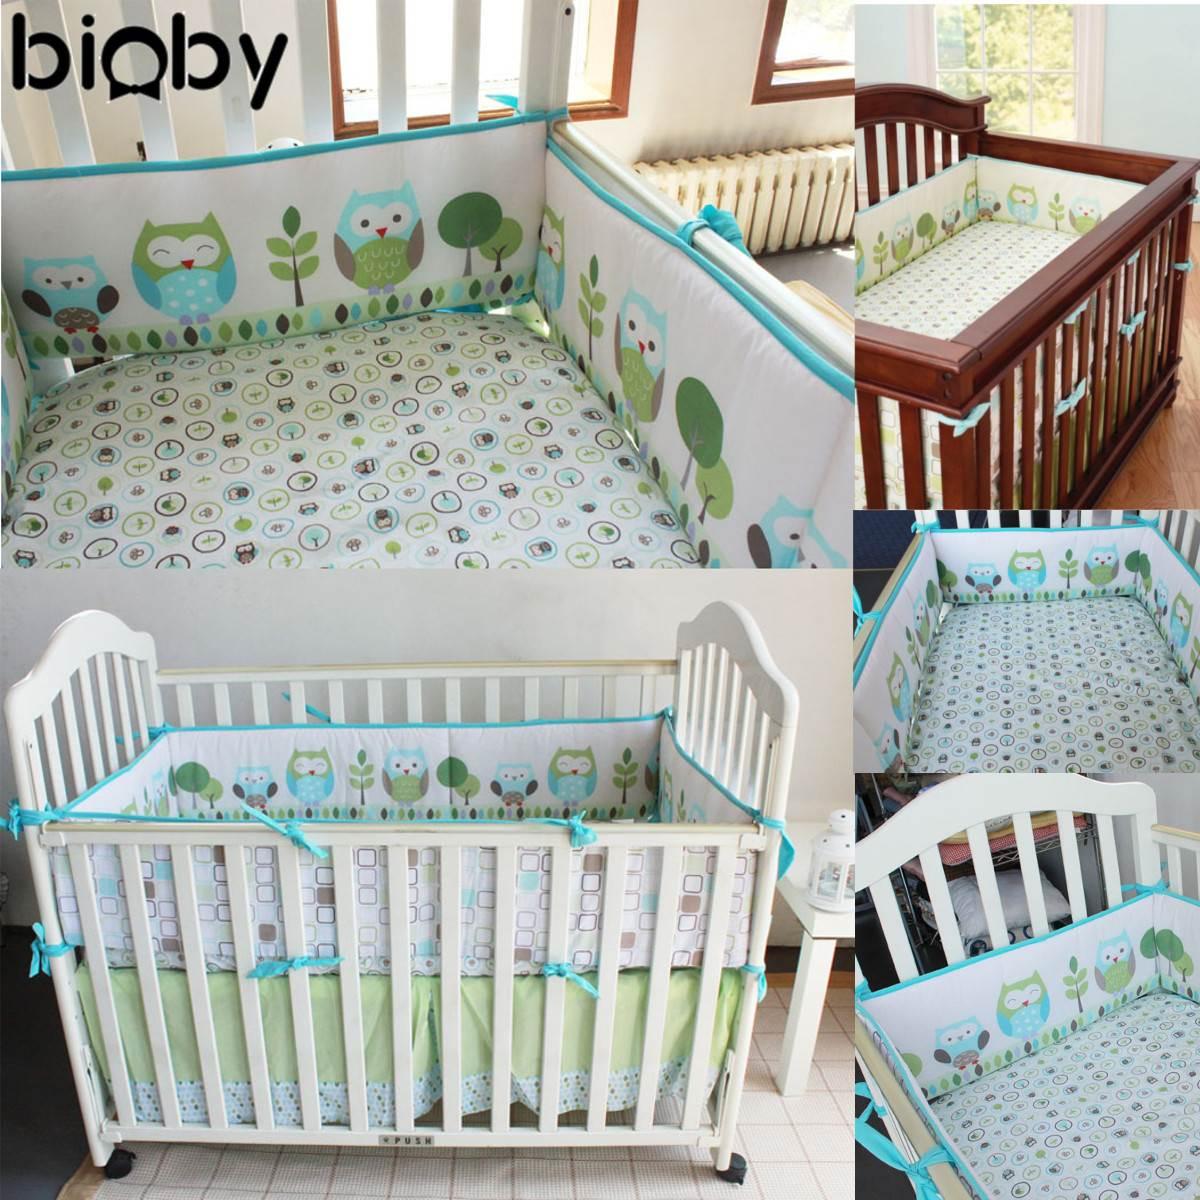 Owl baby boy bedding - 4pcs Cute Owl Baby Infant Cot Crib Bumper Safety Protector Toddler Nursery Bedding Set Cushion Pad